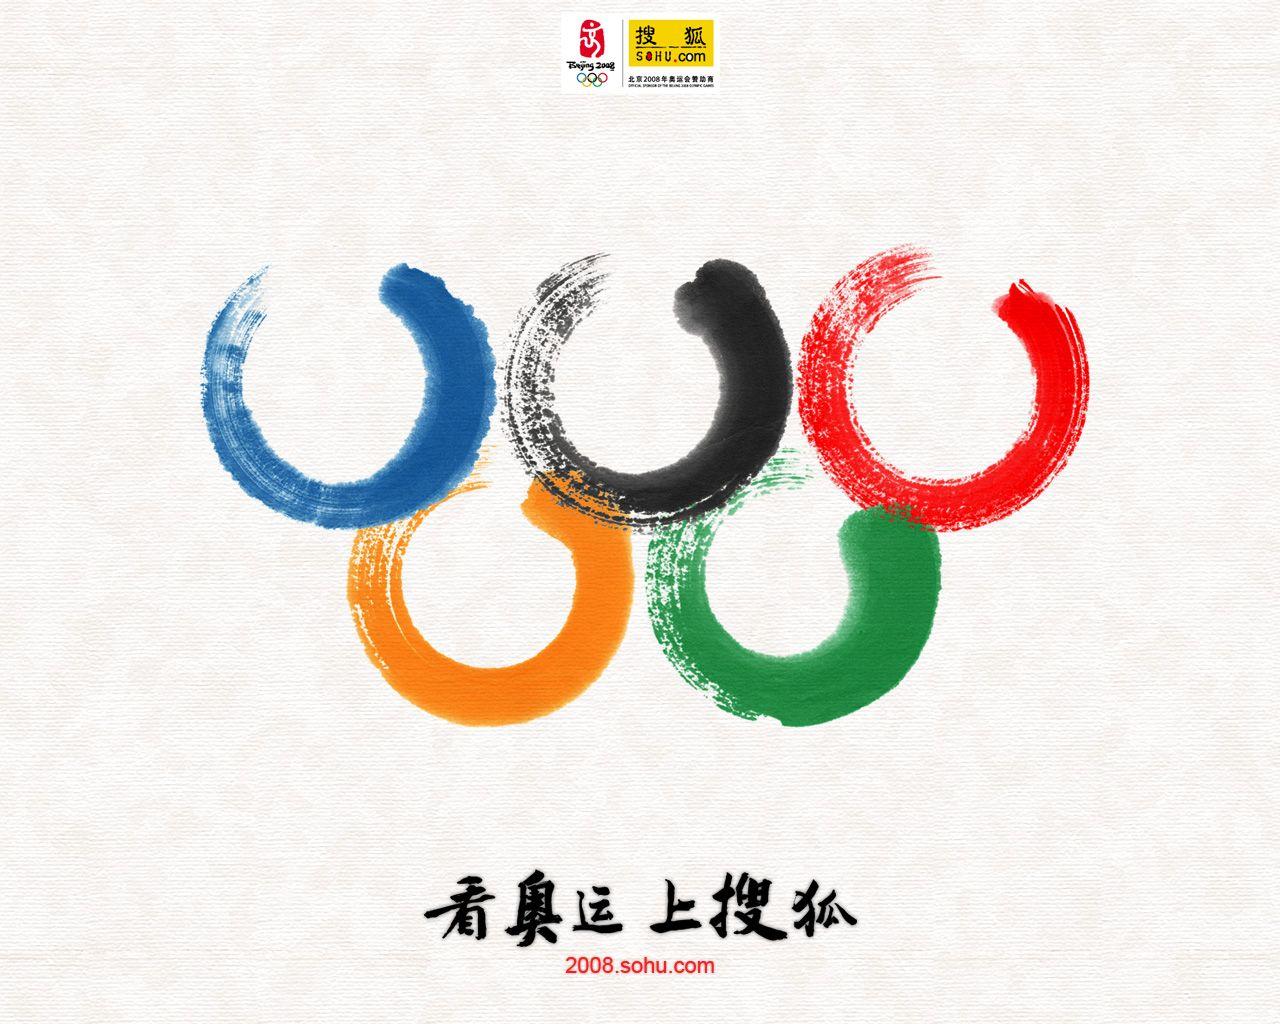 2008olympicsgamesbeijingchinaposter design inspiration history of olympics poster design 1996 2014 historical posters olympics poster design in biocorpaavc Choice Image